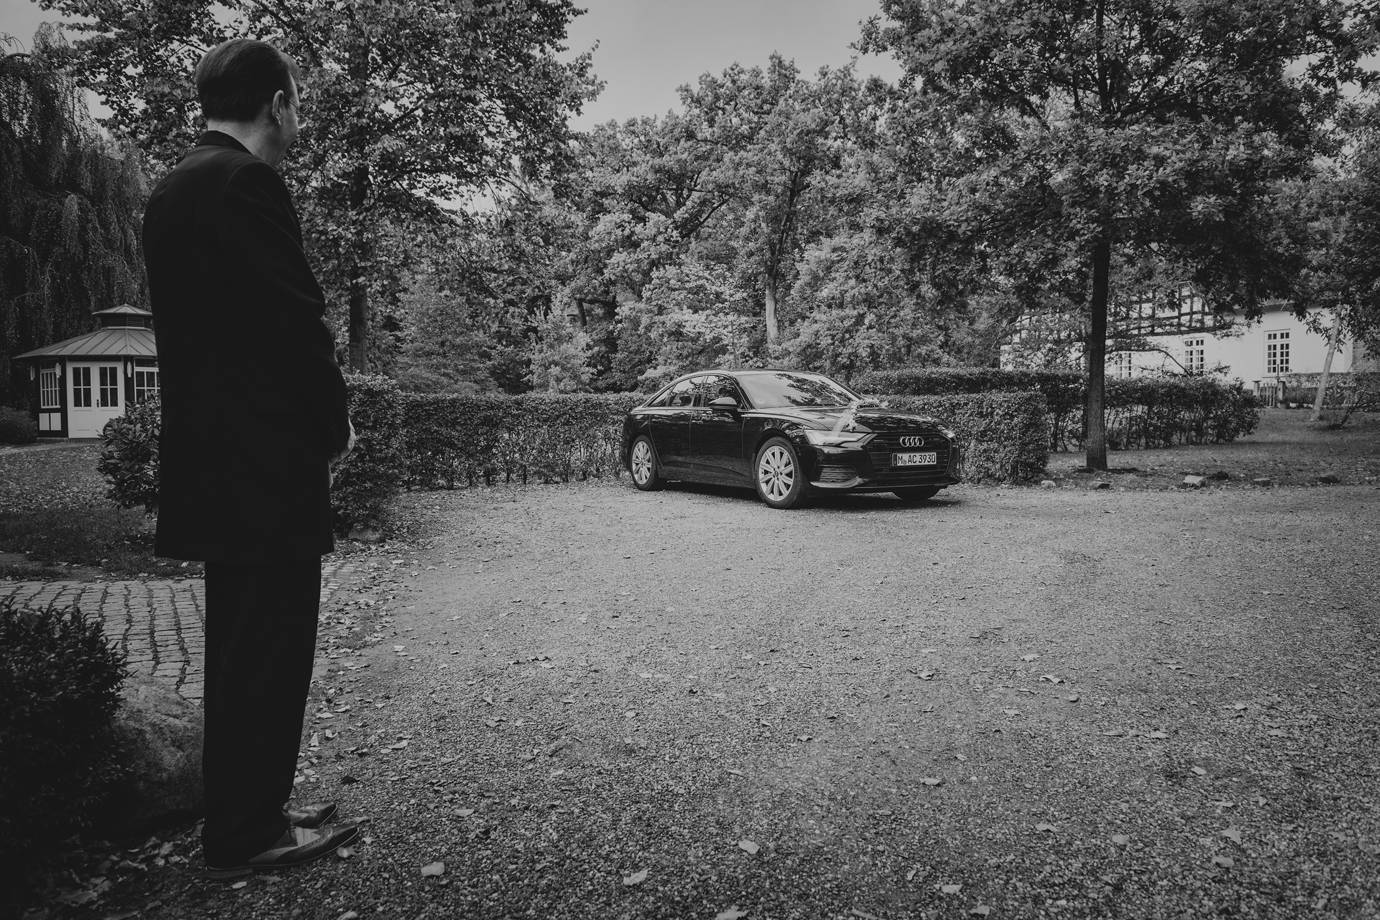 hochzeitsfotograf luer kropp hof 039 - Friderike+Florian